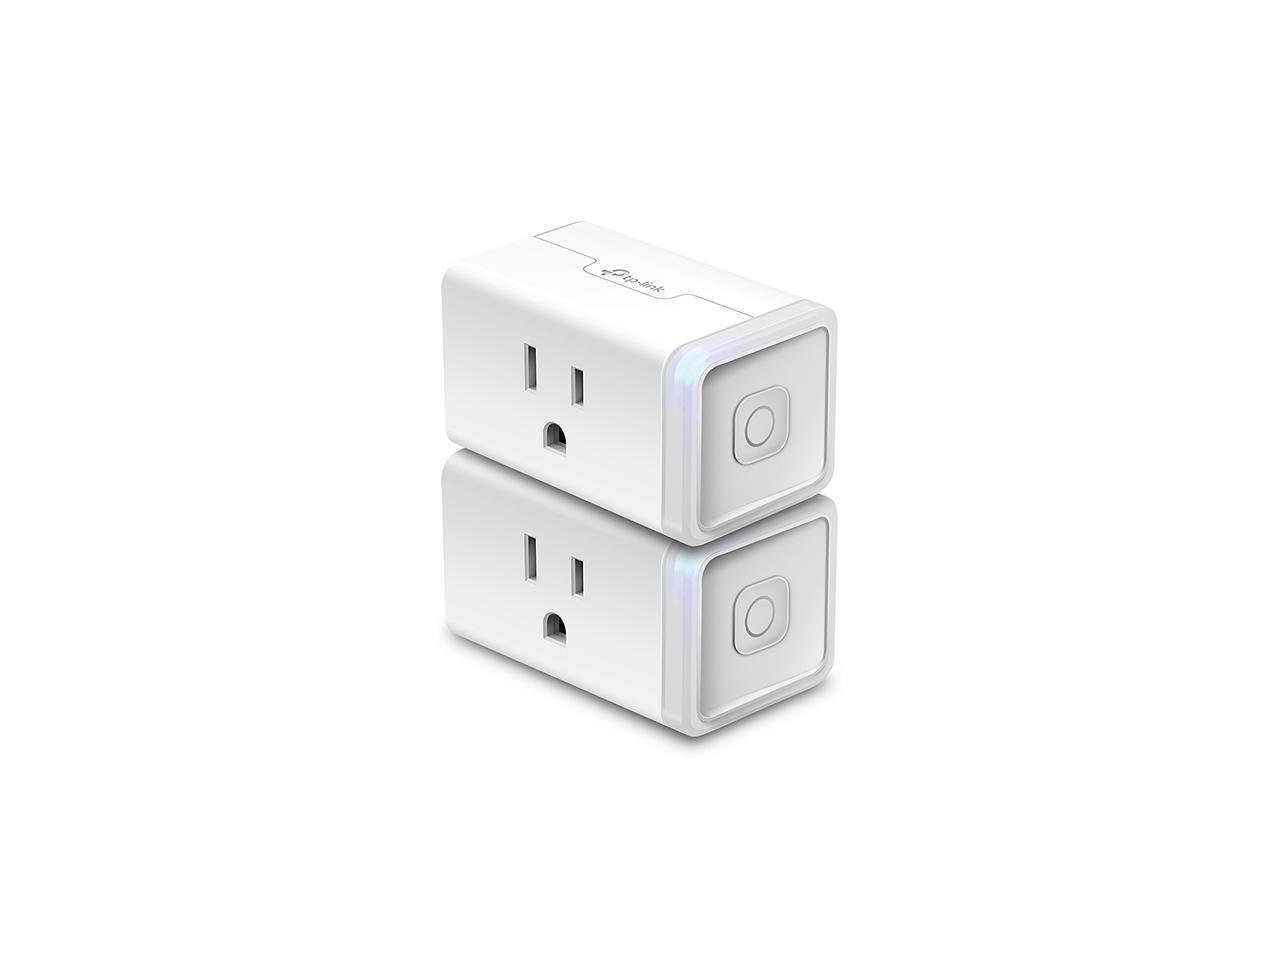 TP-Link Accessory KP100 Kasa Smart Wi-Fi Plug KIT  - Slim Edition 2-Pack @Newegg $18